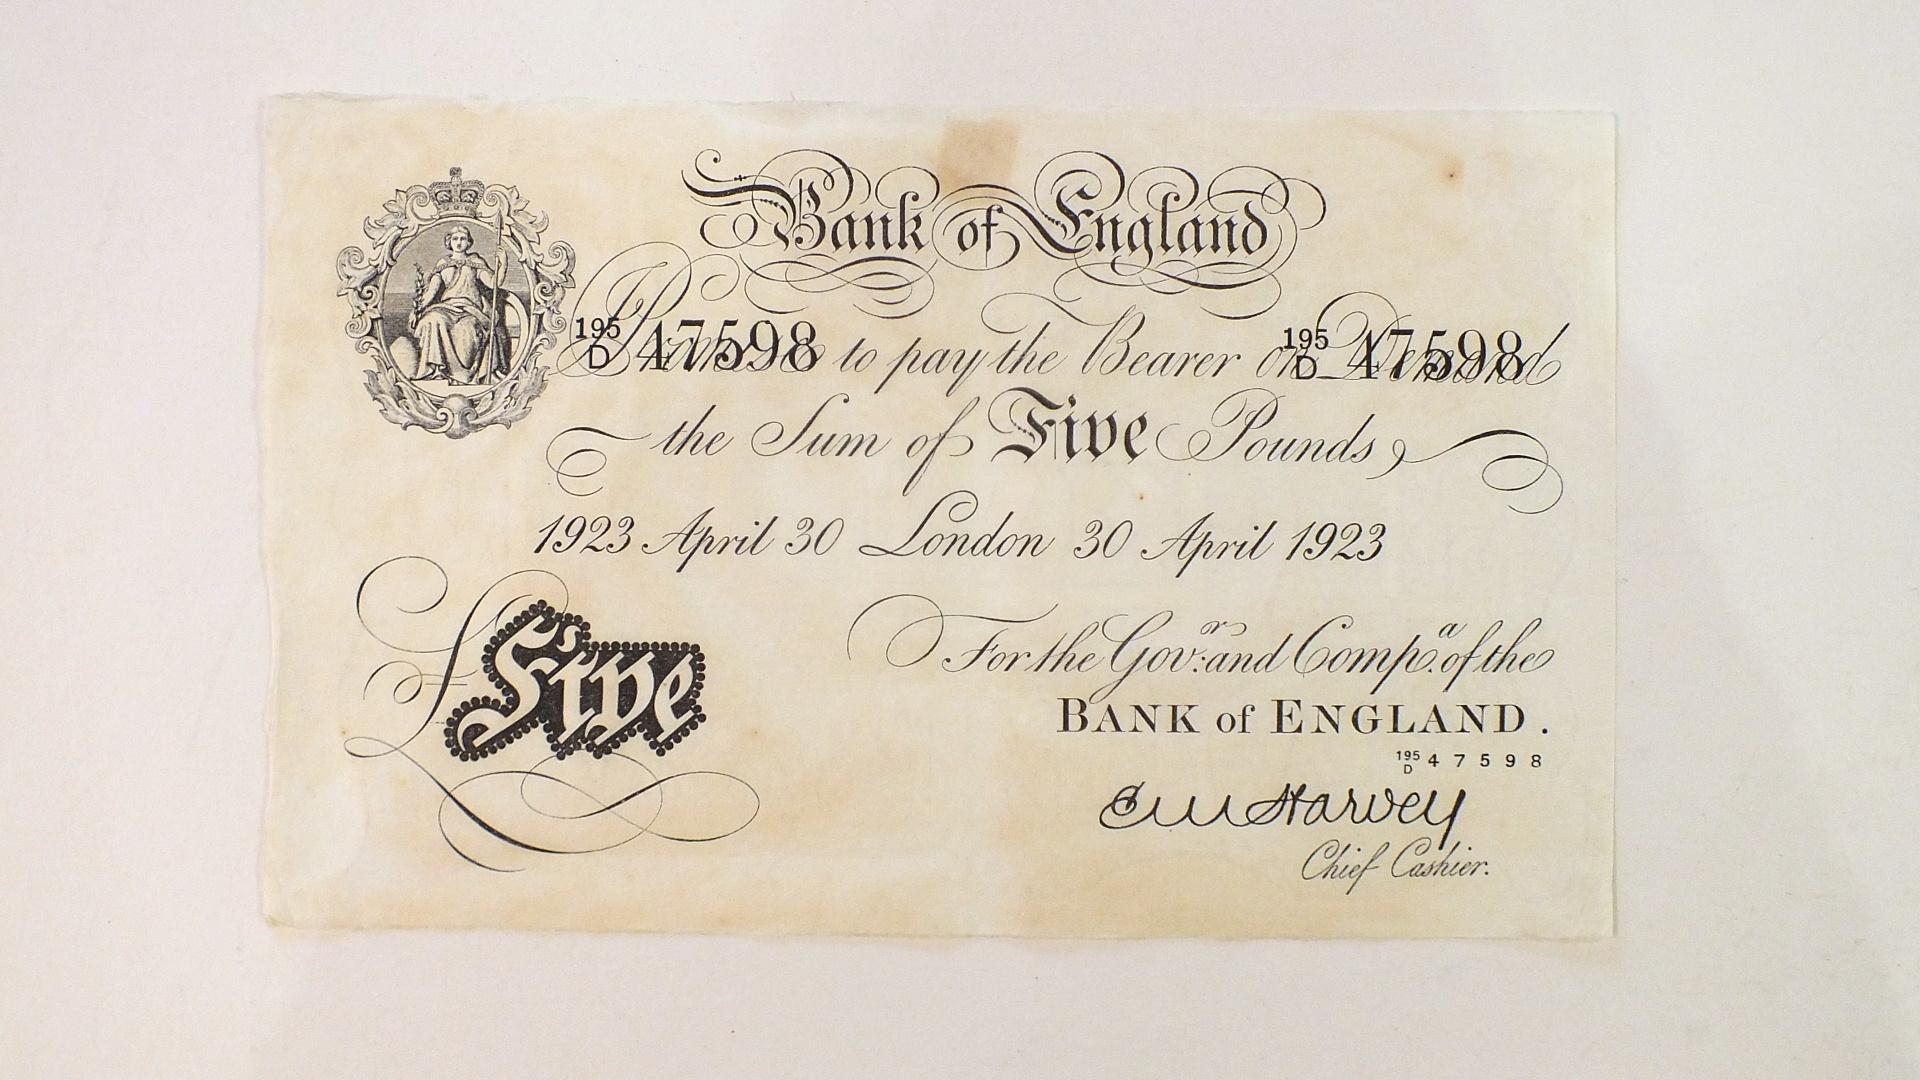 Lot 177 - A Bank of England pre-1925 black and white £5 note April 30 1923 195/D 47598, cashier E. M.